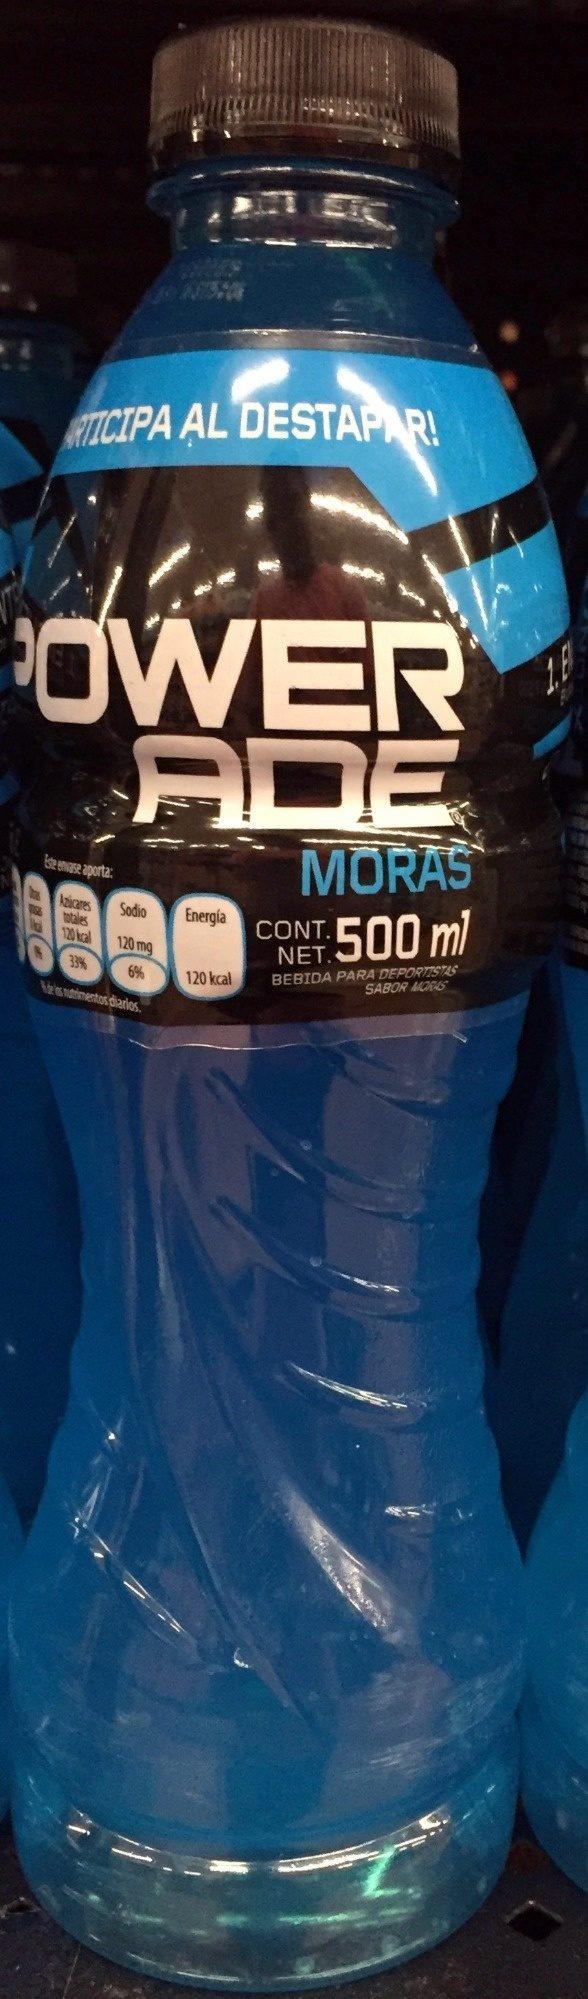 Powerade sabor Moras - Product